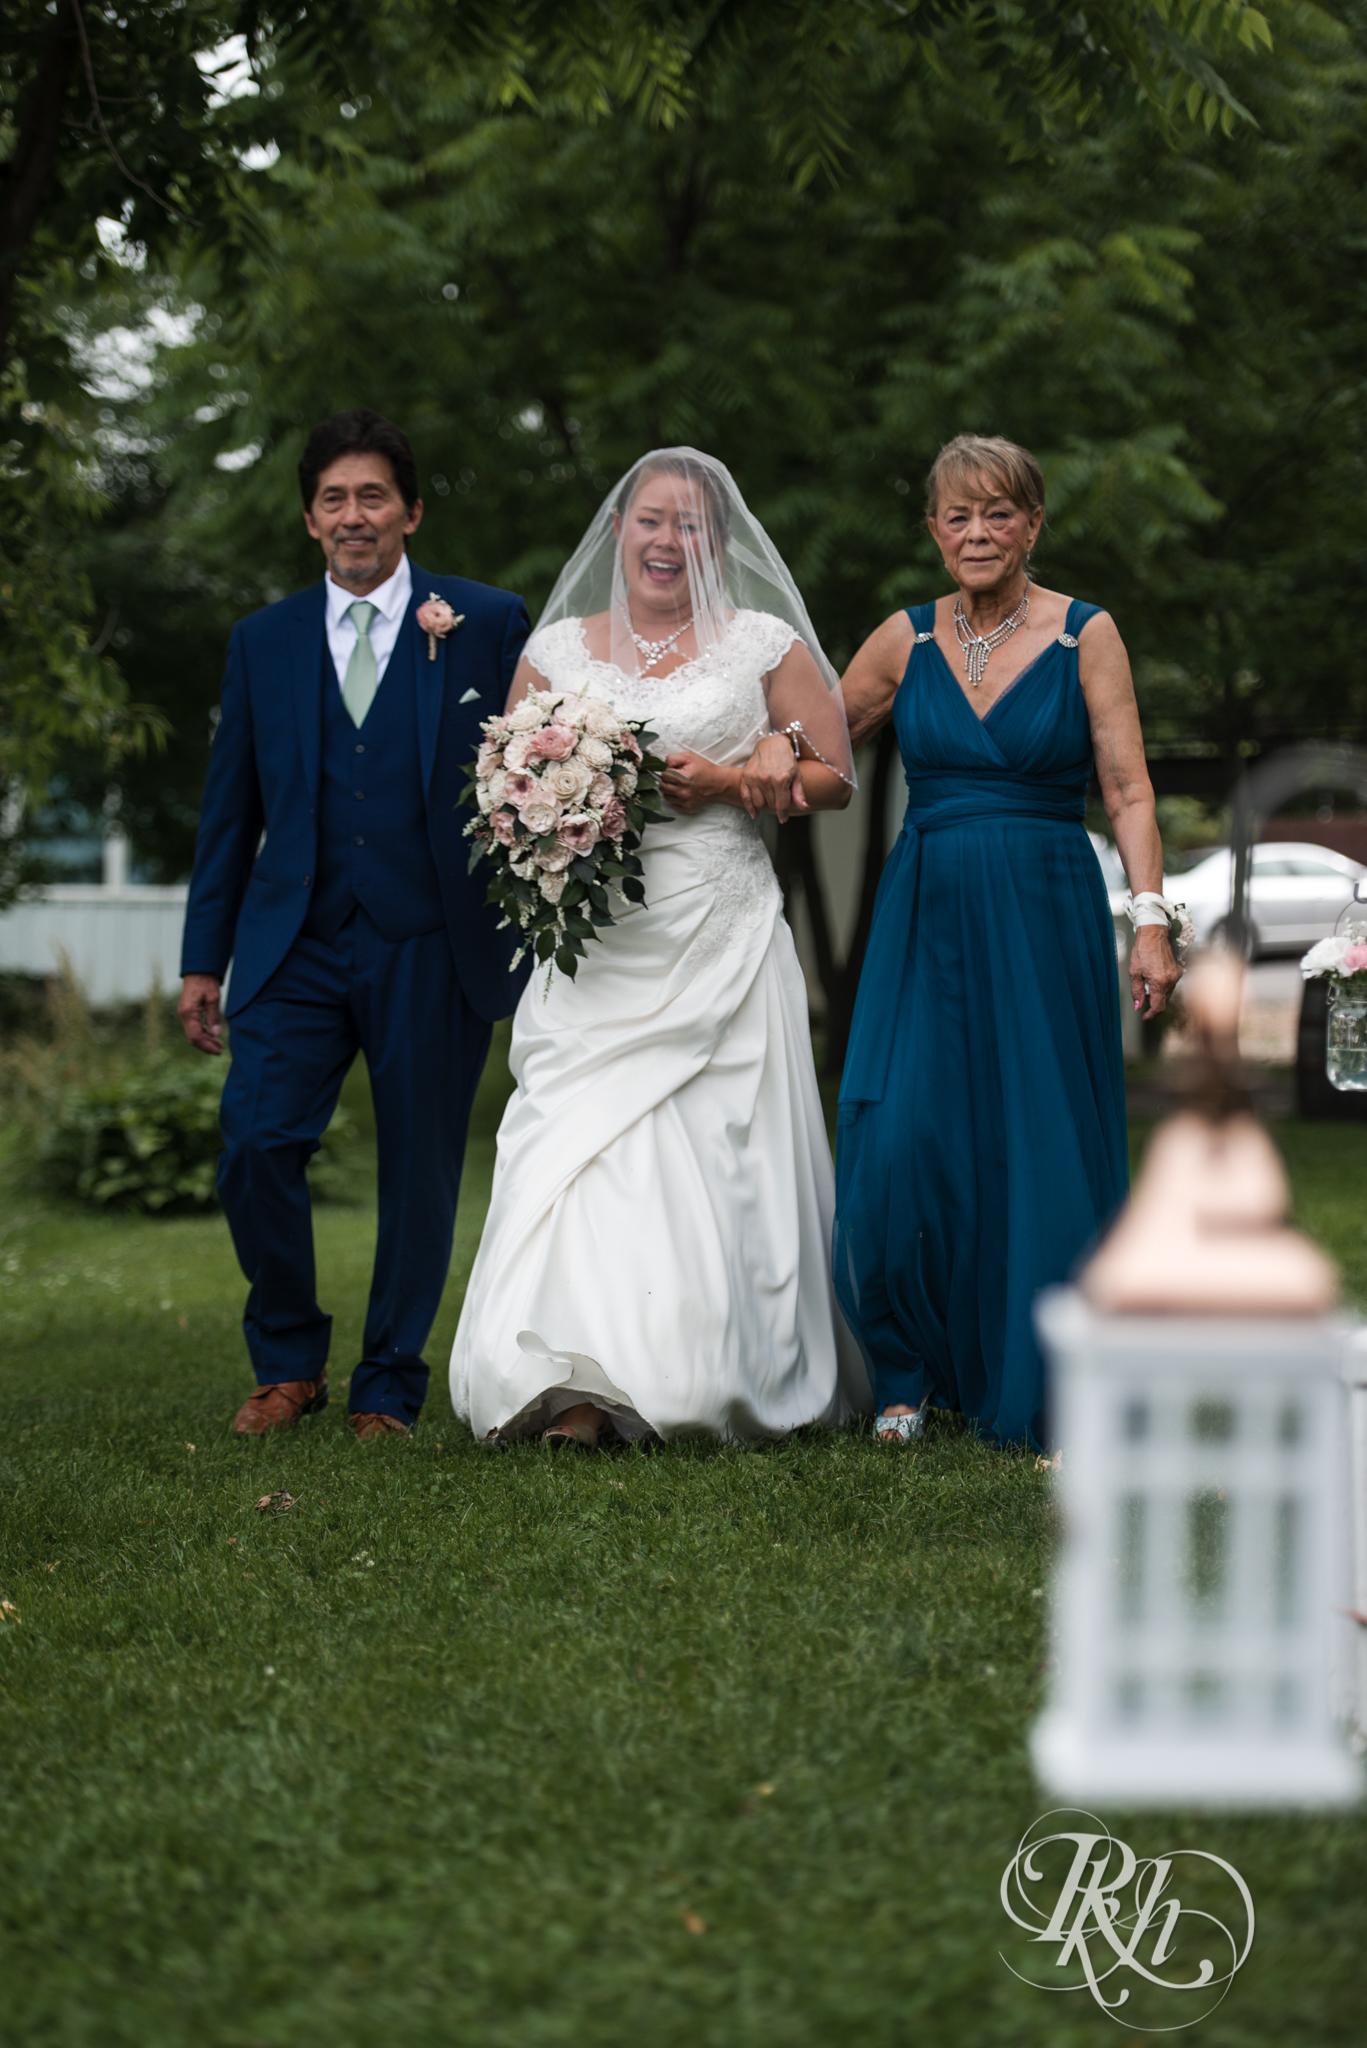 Ally & Nick - Minnesota Wedding Photography - Next Chapter Winery - RKH Images - Blog (14 of 57).jpg